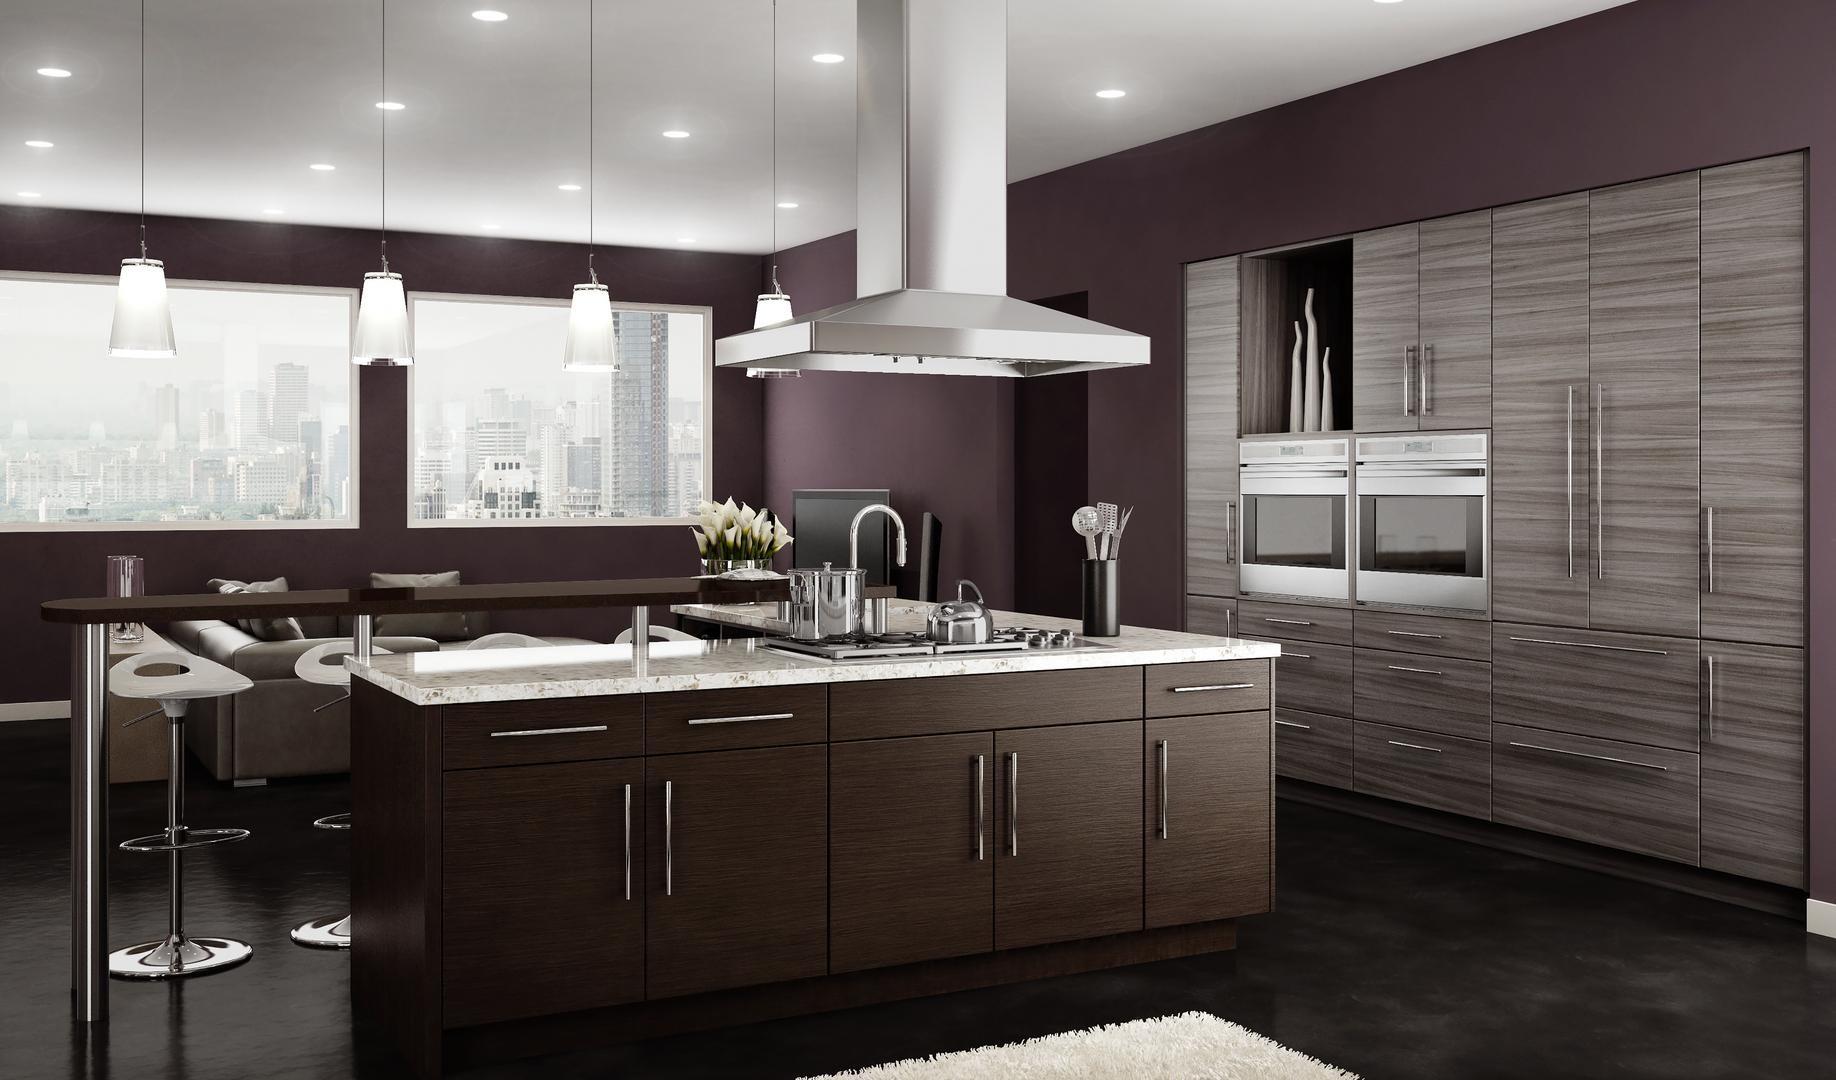 brightech-top-interior-designers-in-henderson design open space table